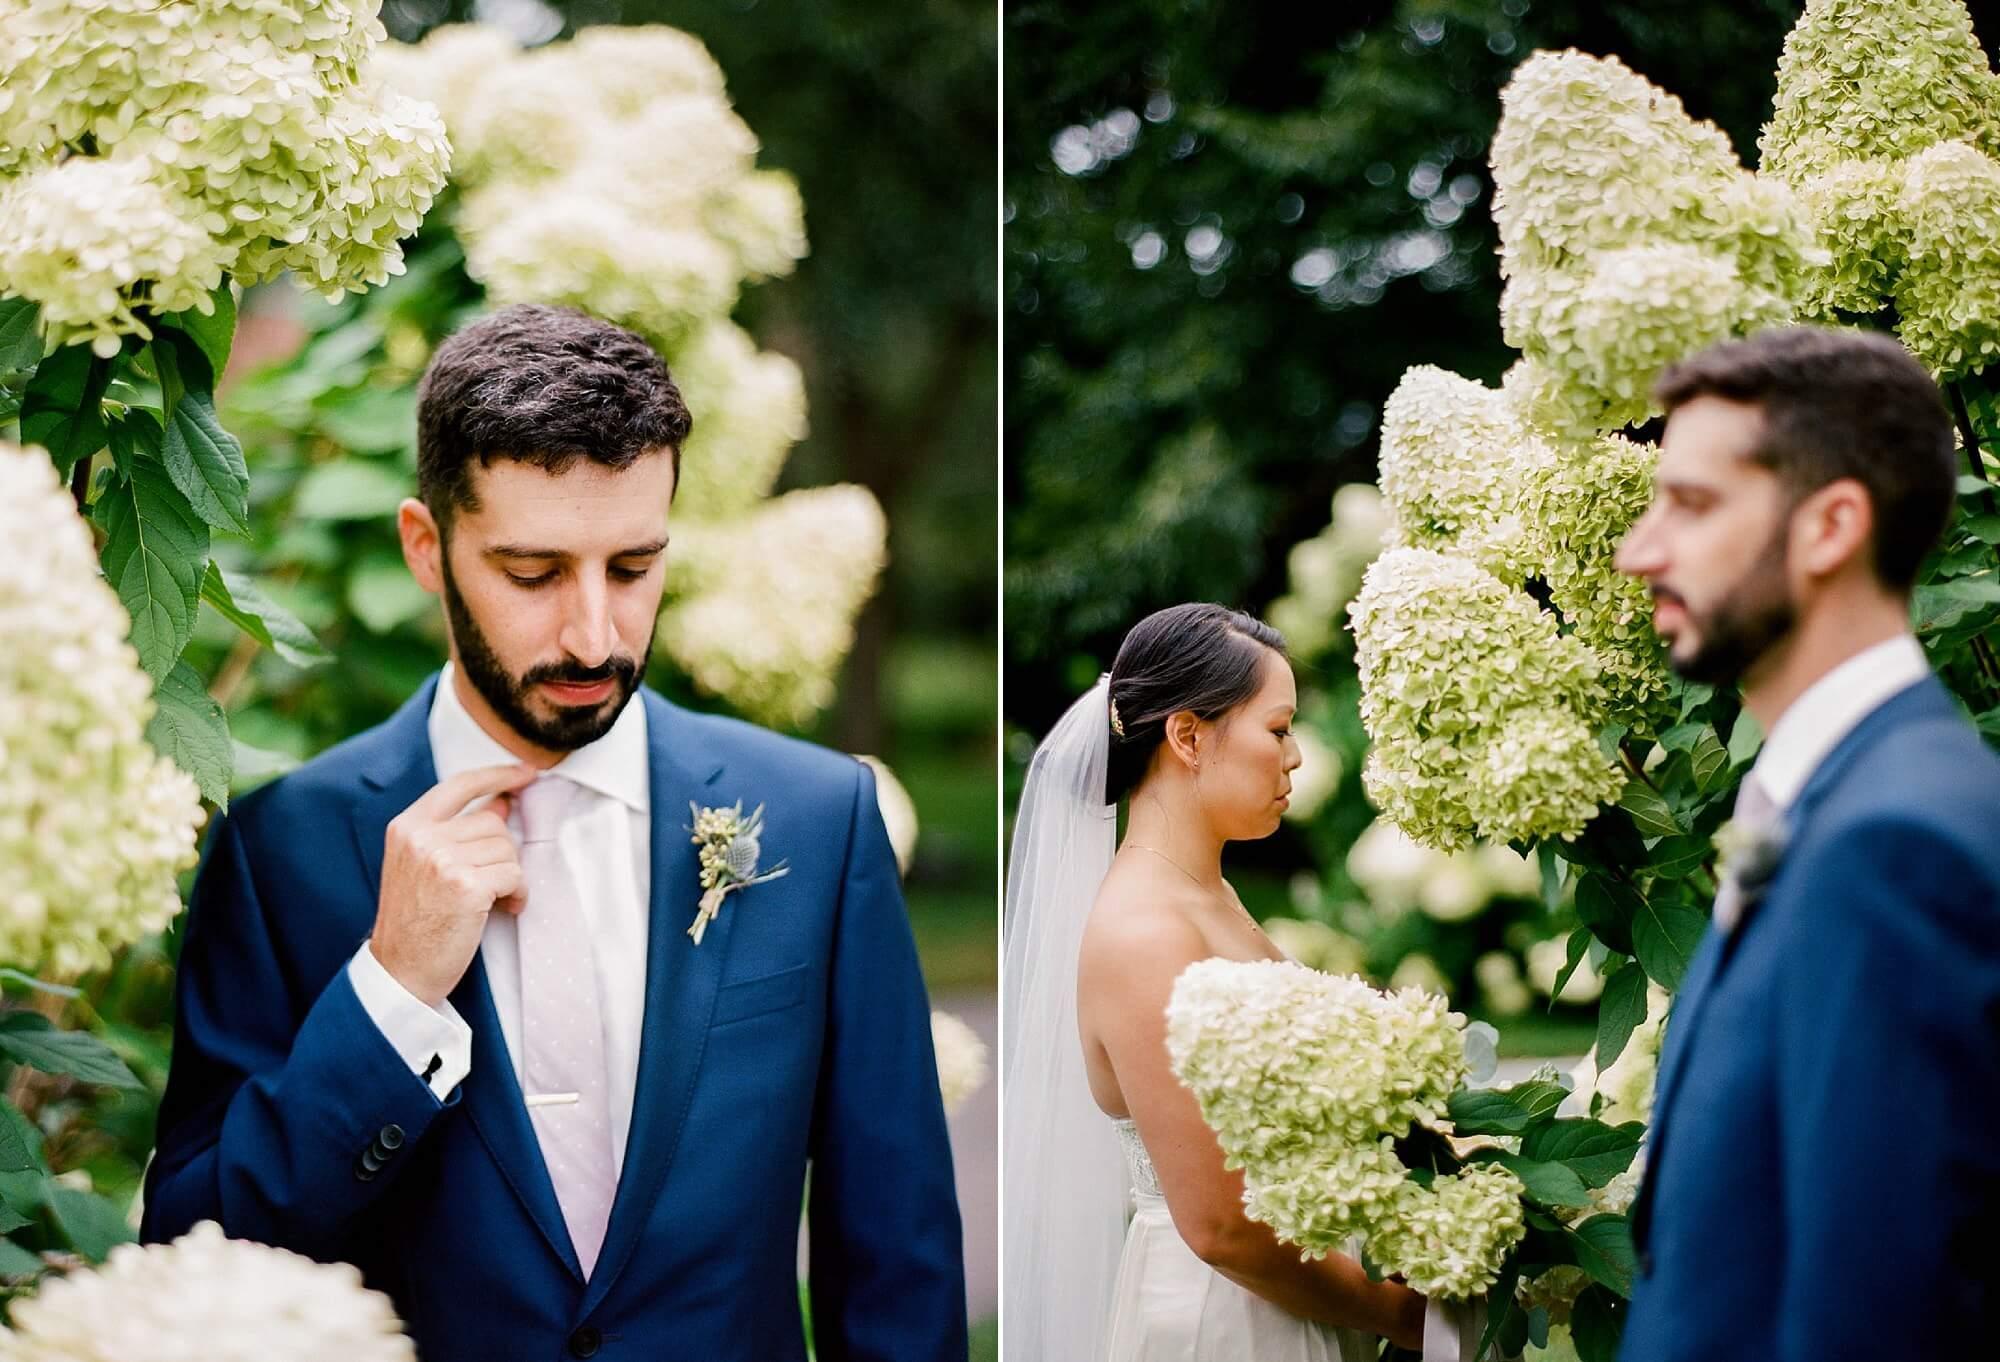 Gardens at Elm Bank wedding - Ebersole Photography -8.jpg